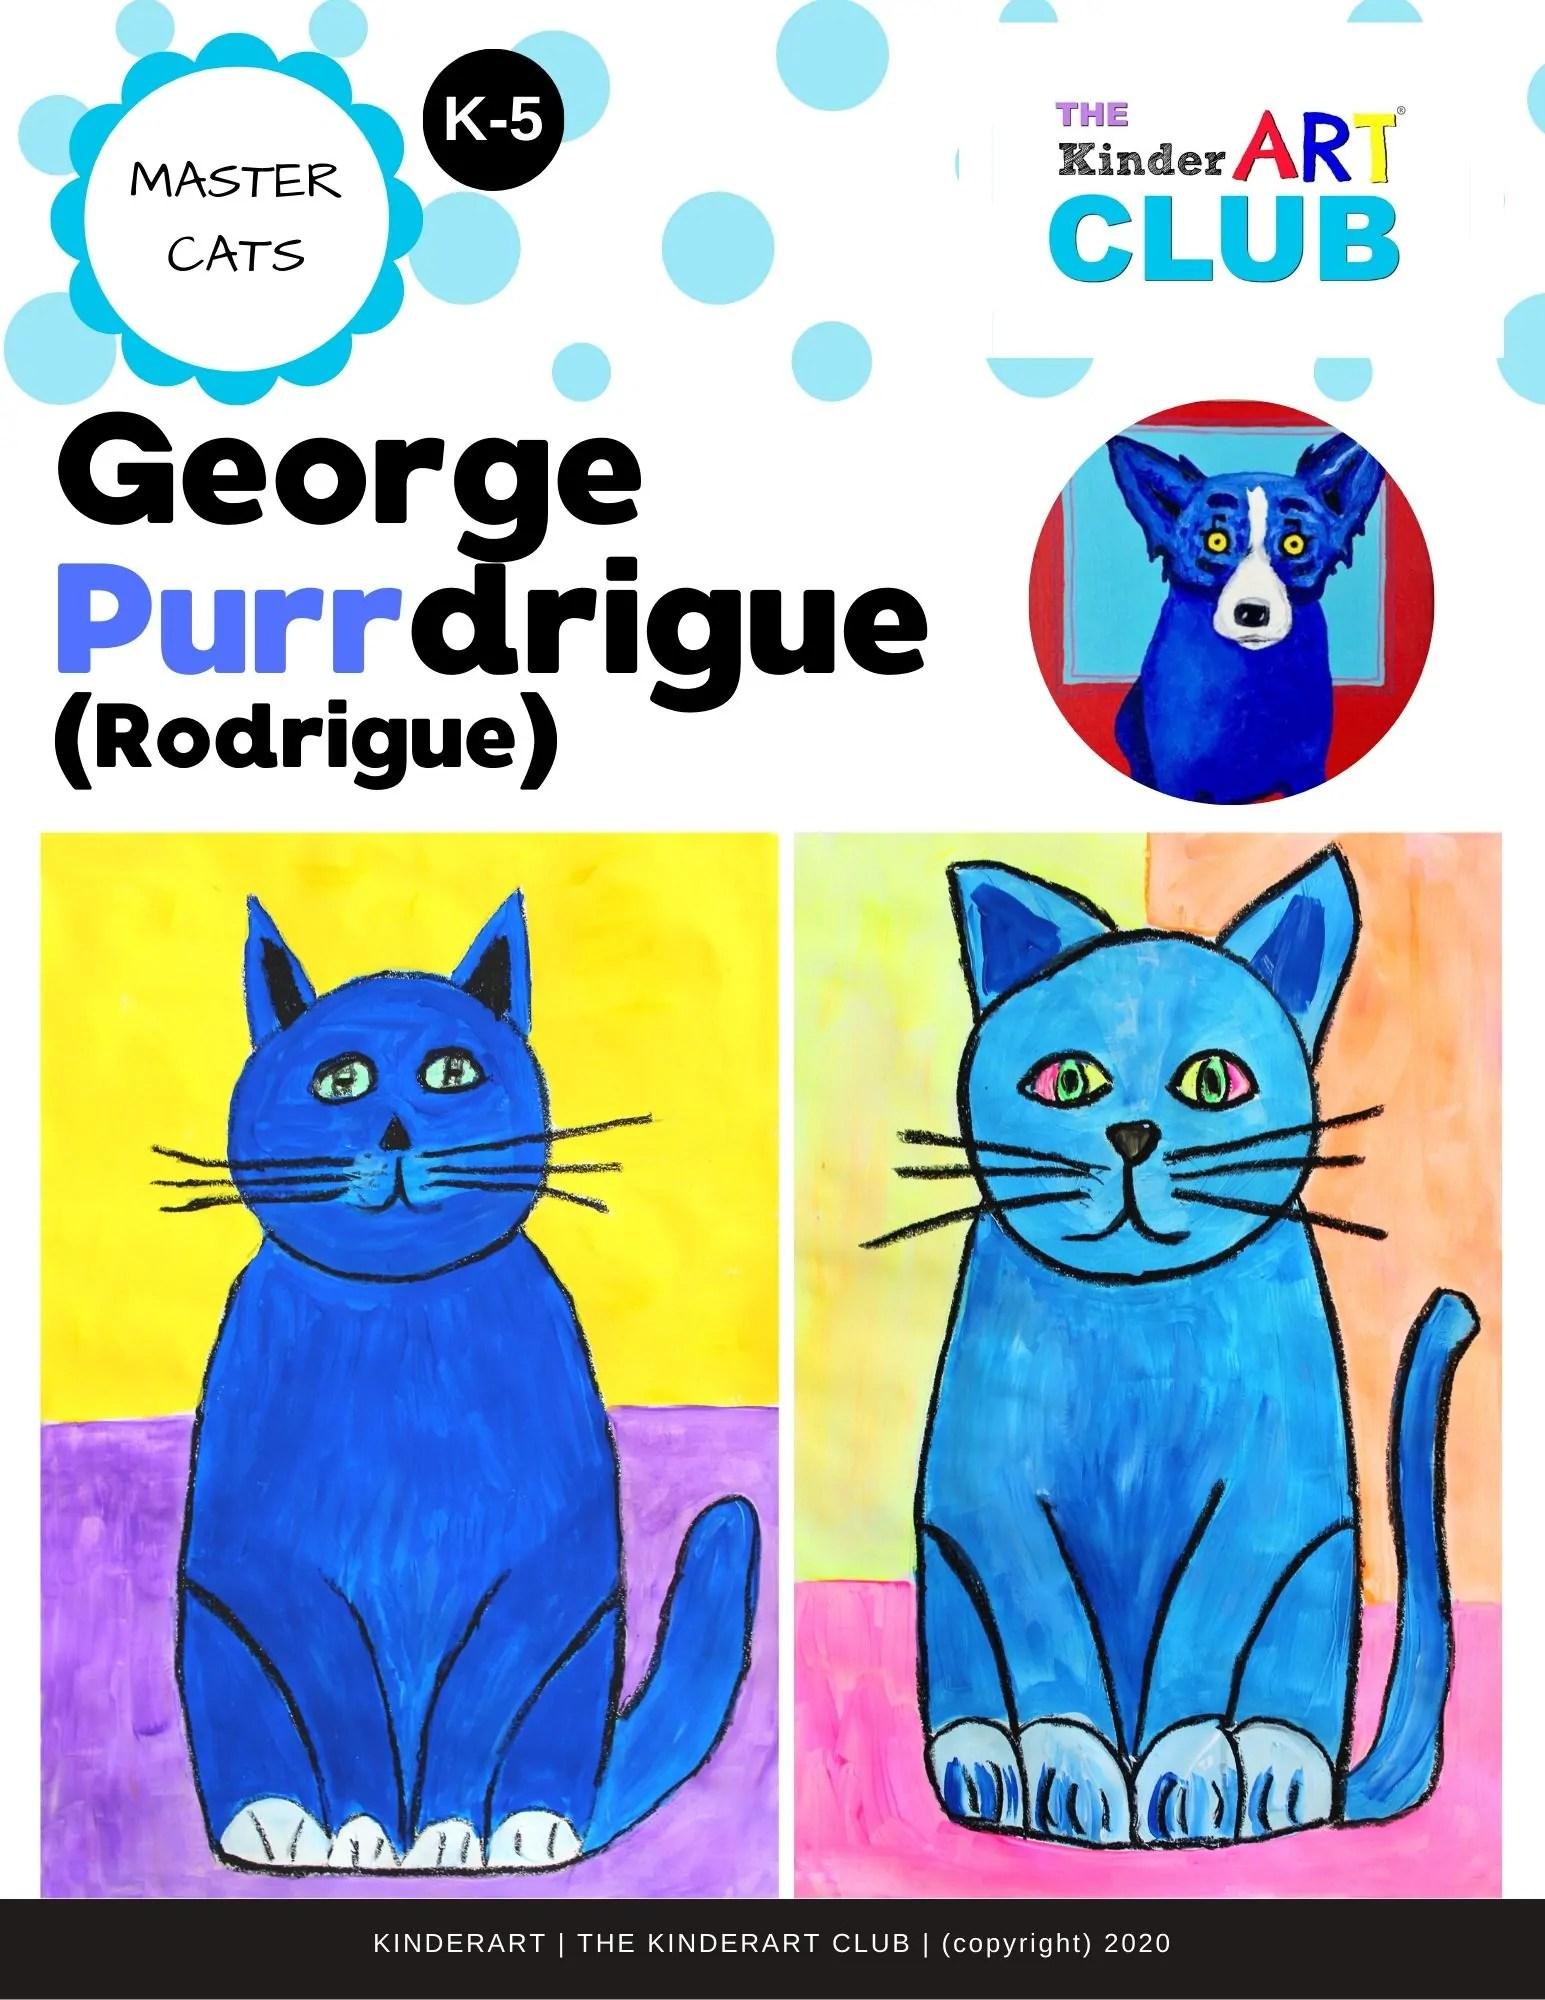 Lesson George Purrdrige Rodrigue